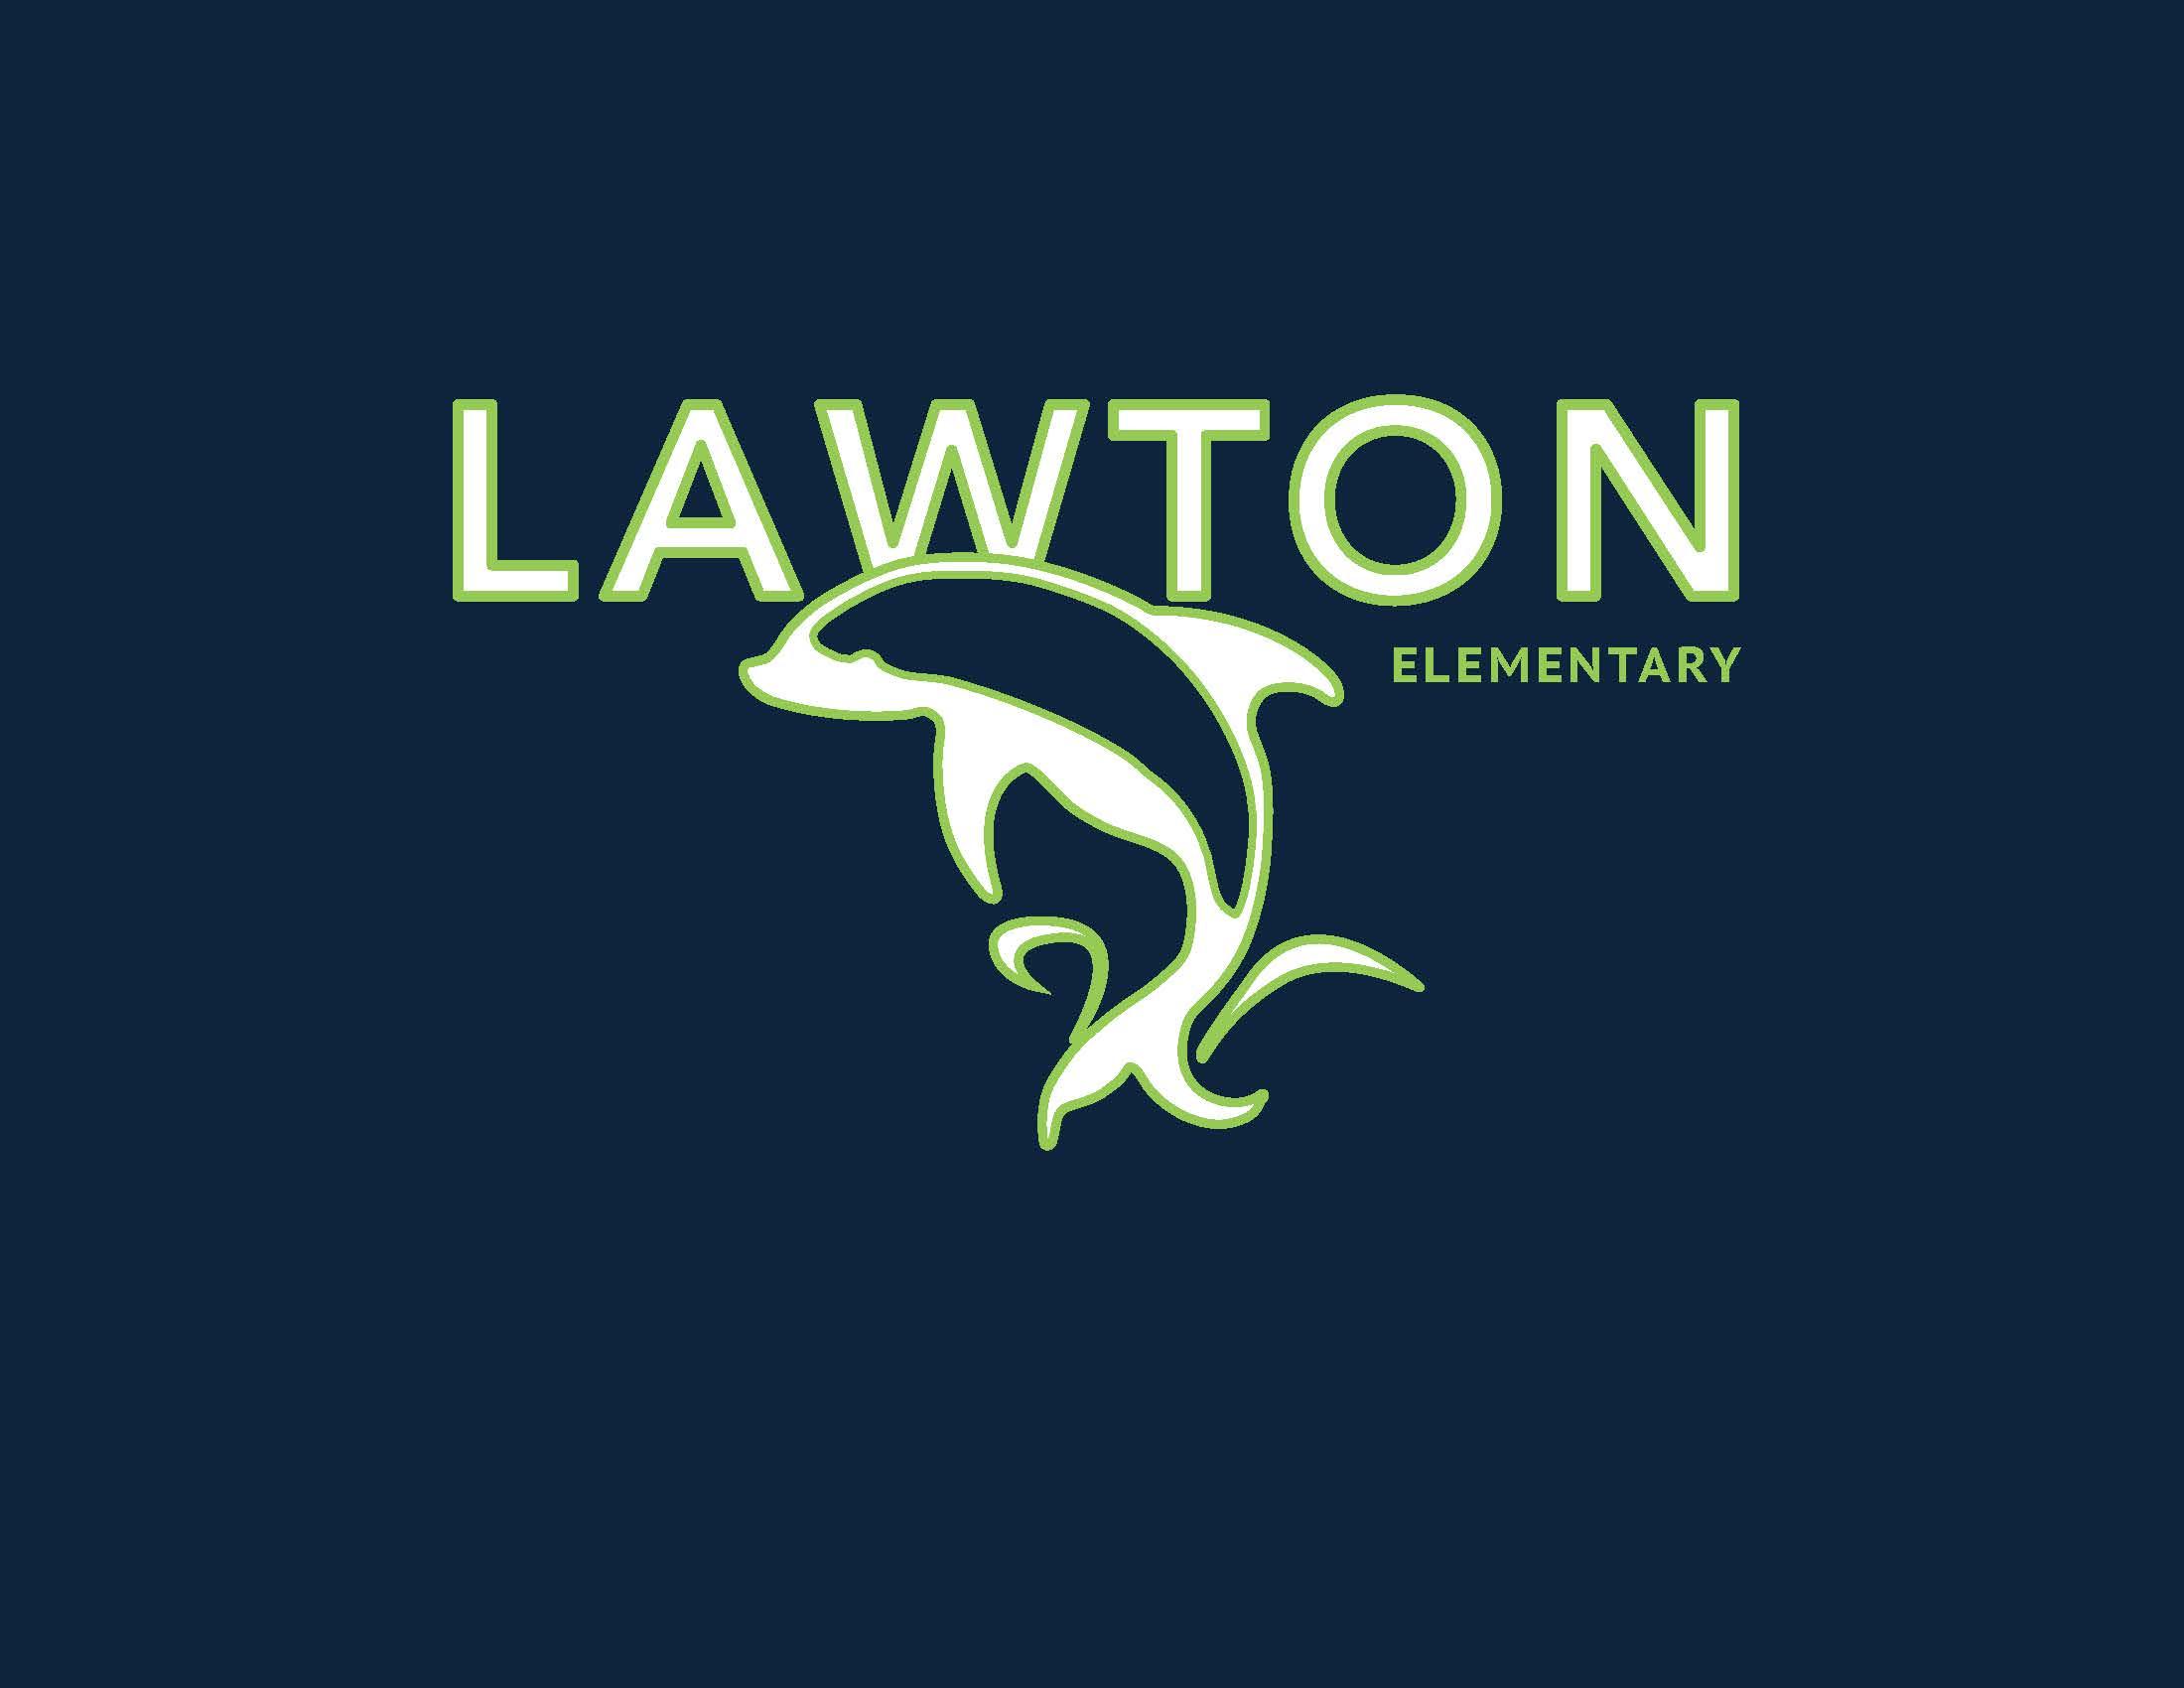 Lawton_Dolphin_Navy